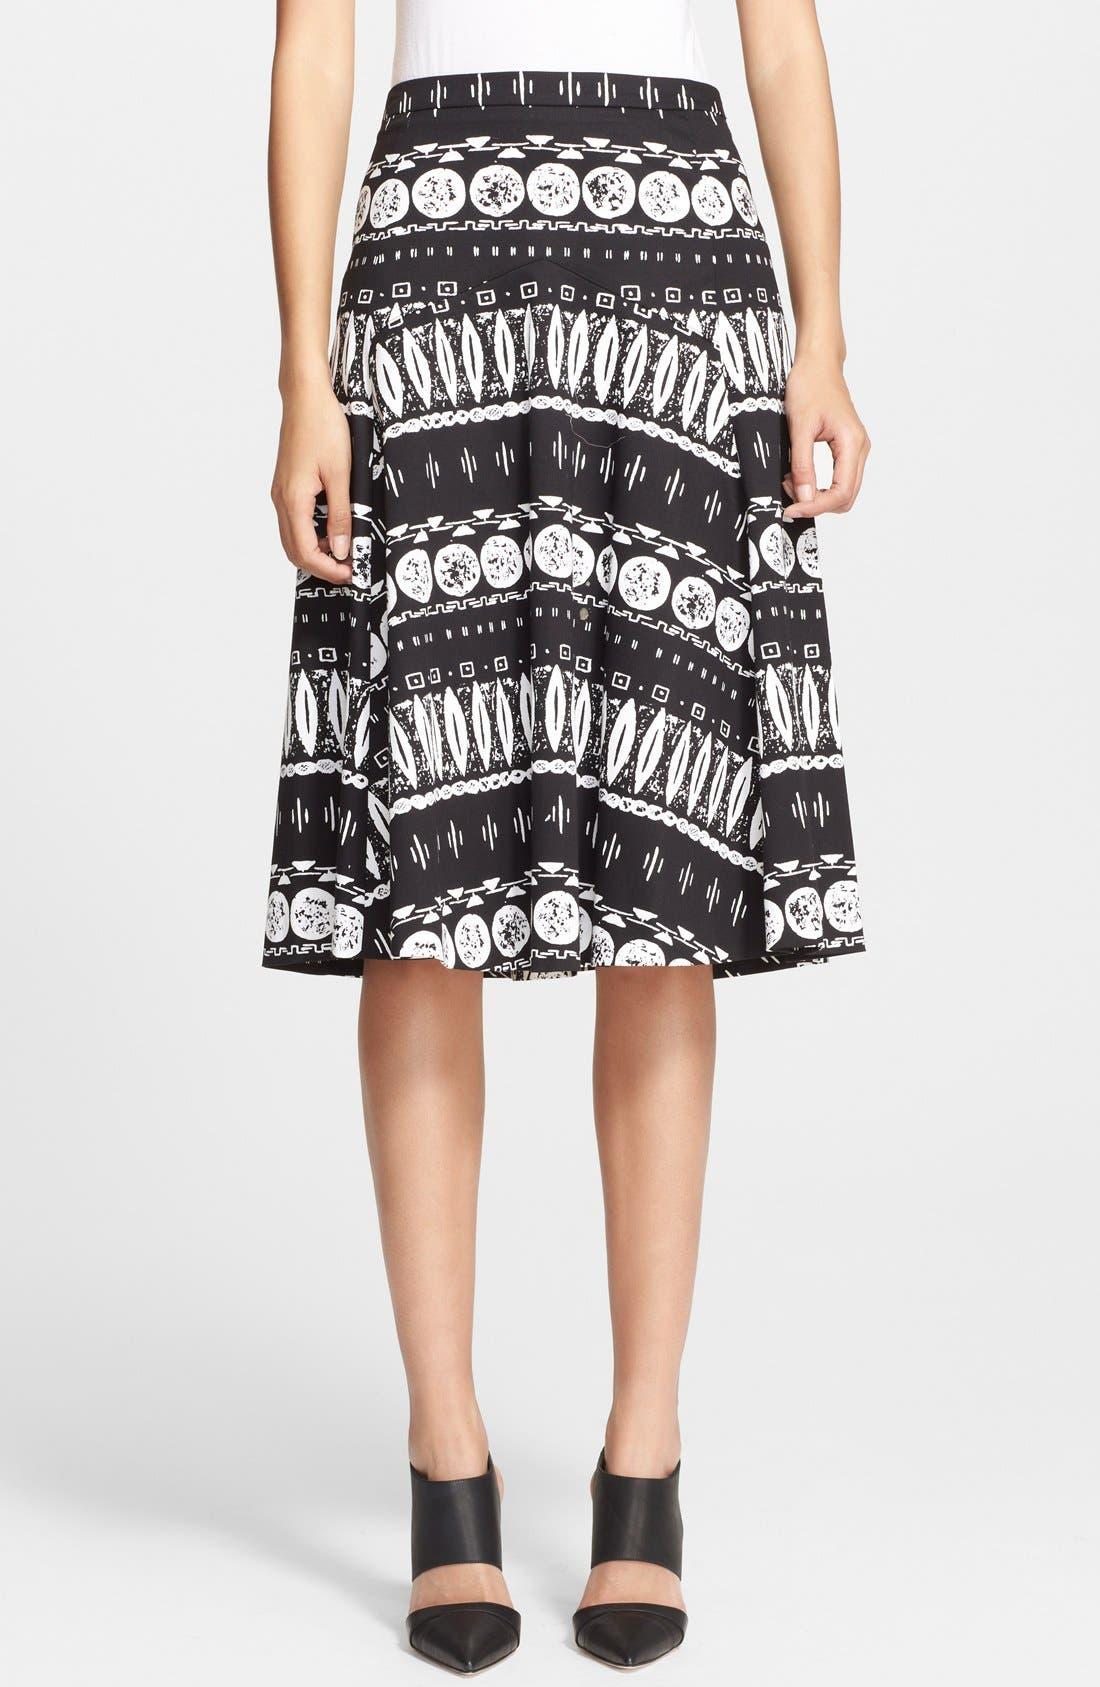 Alternate Image 1 Selected - Veronica Beard Print A-Line Skirt